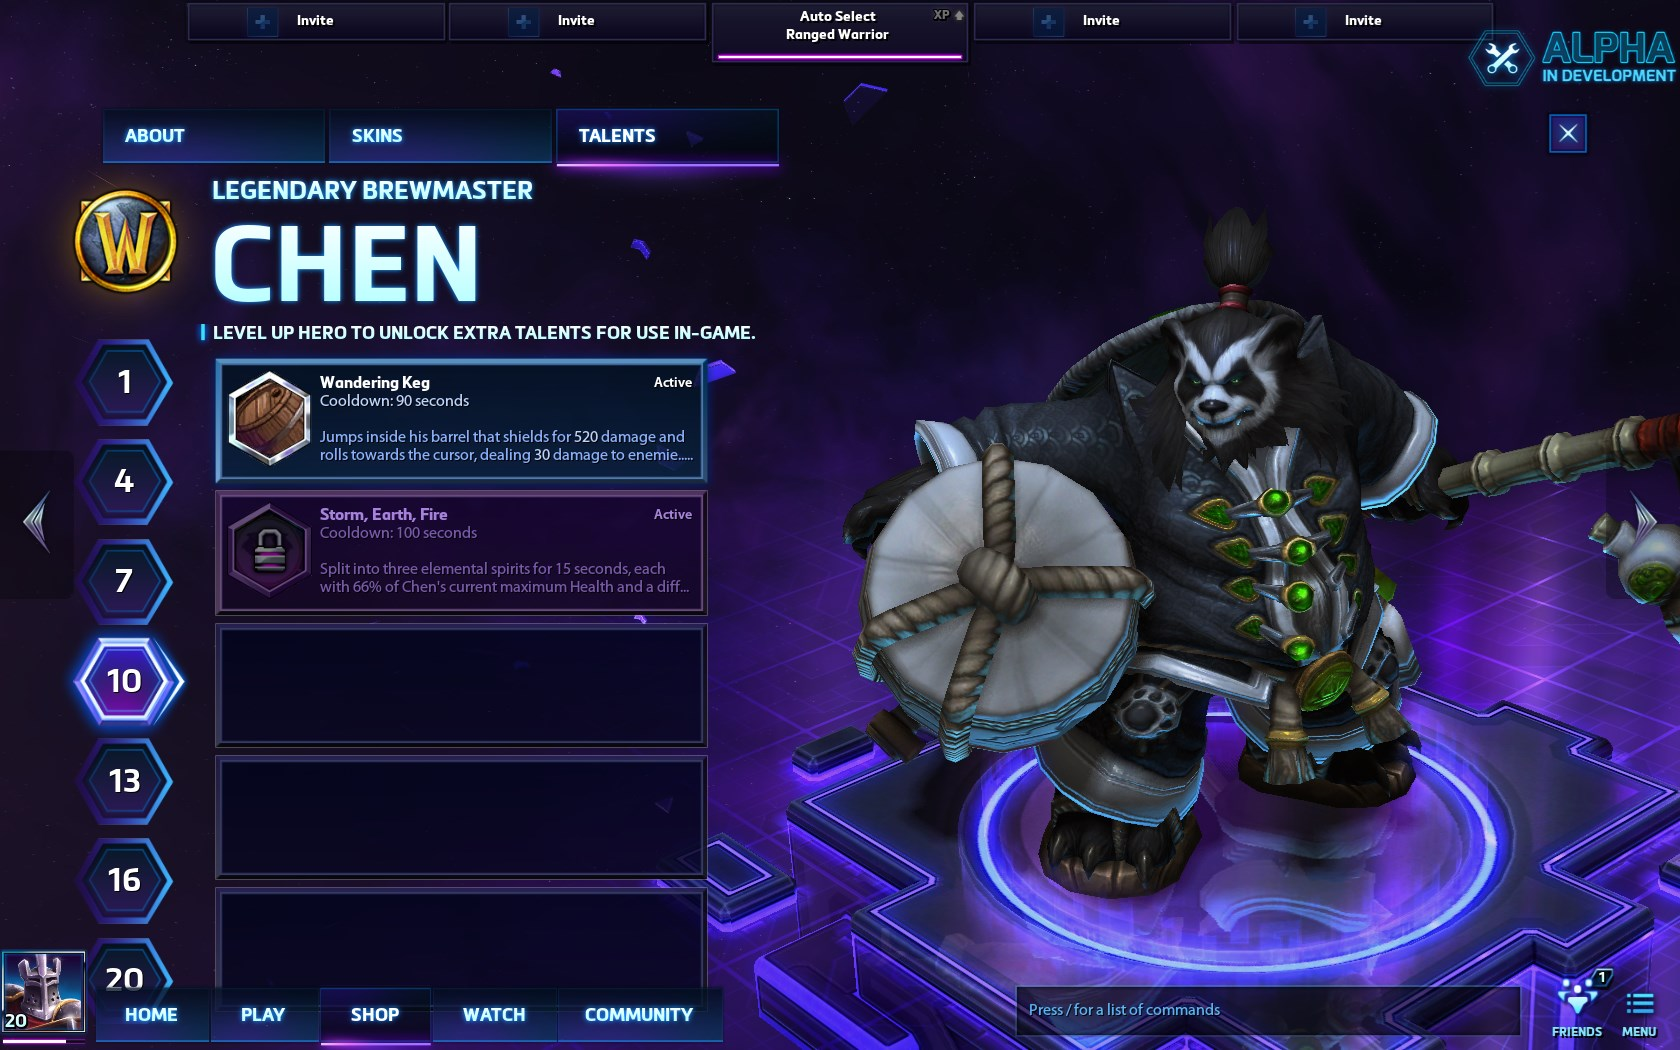 Heroes_Chen_UI_AD_04_tga_jpgcopy